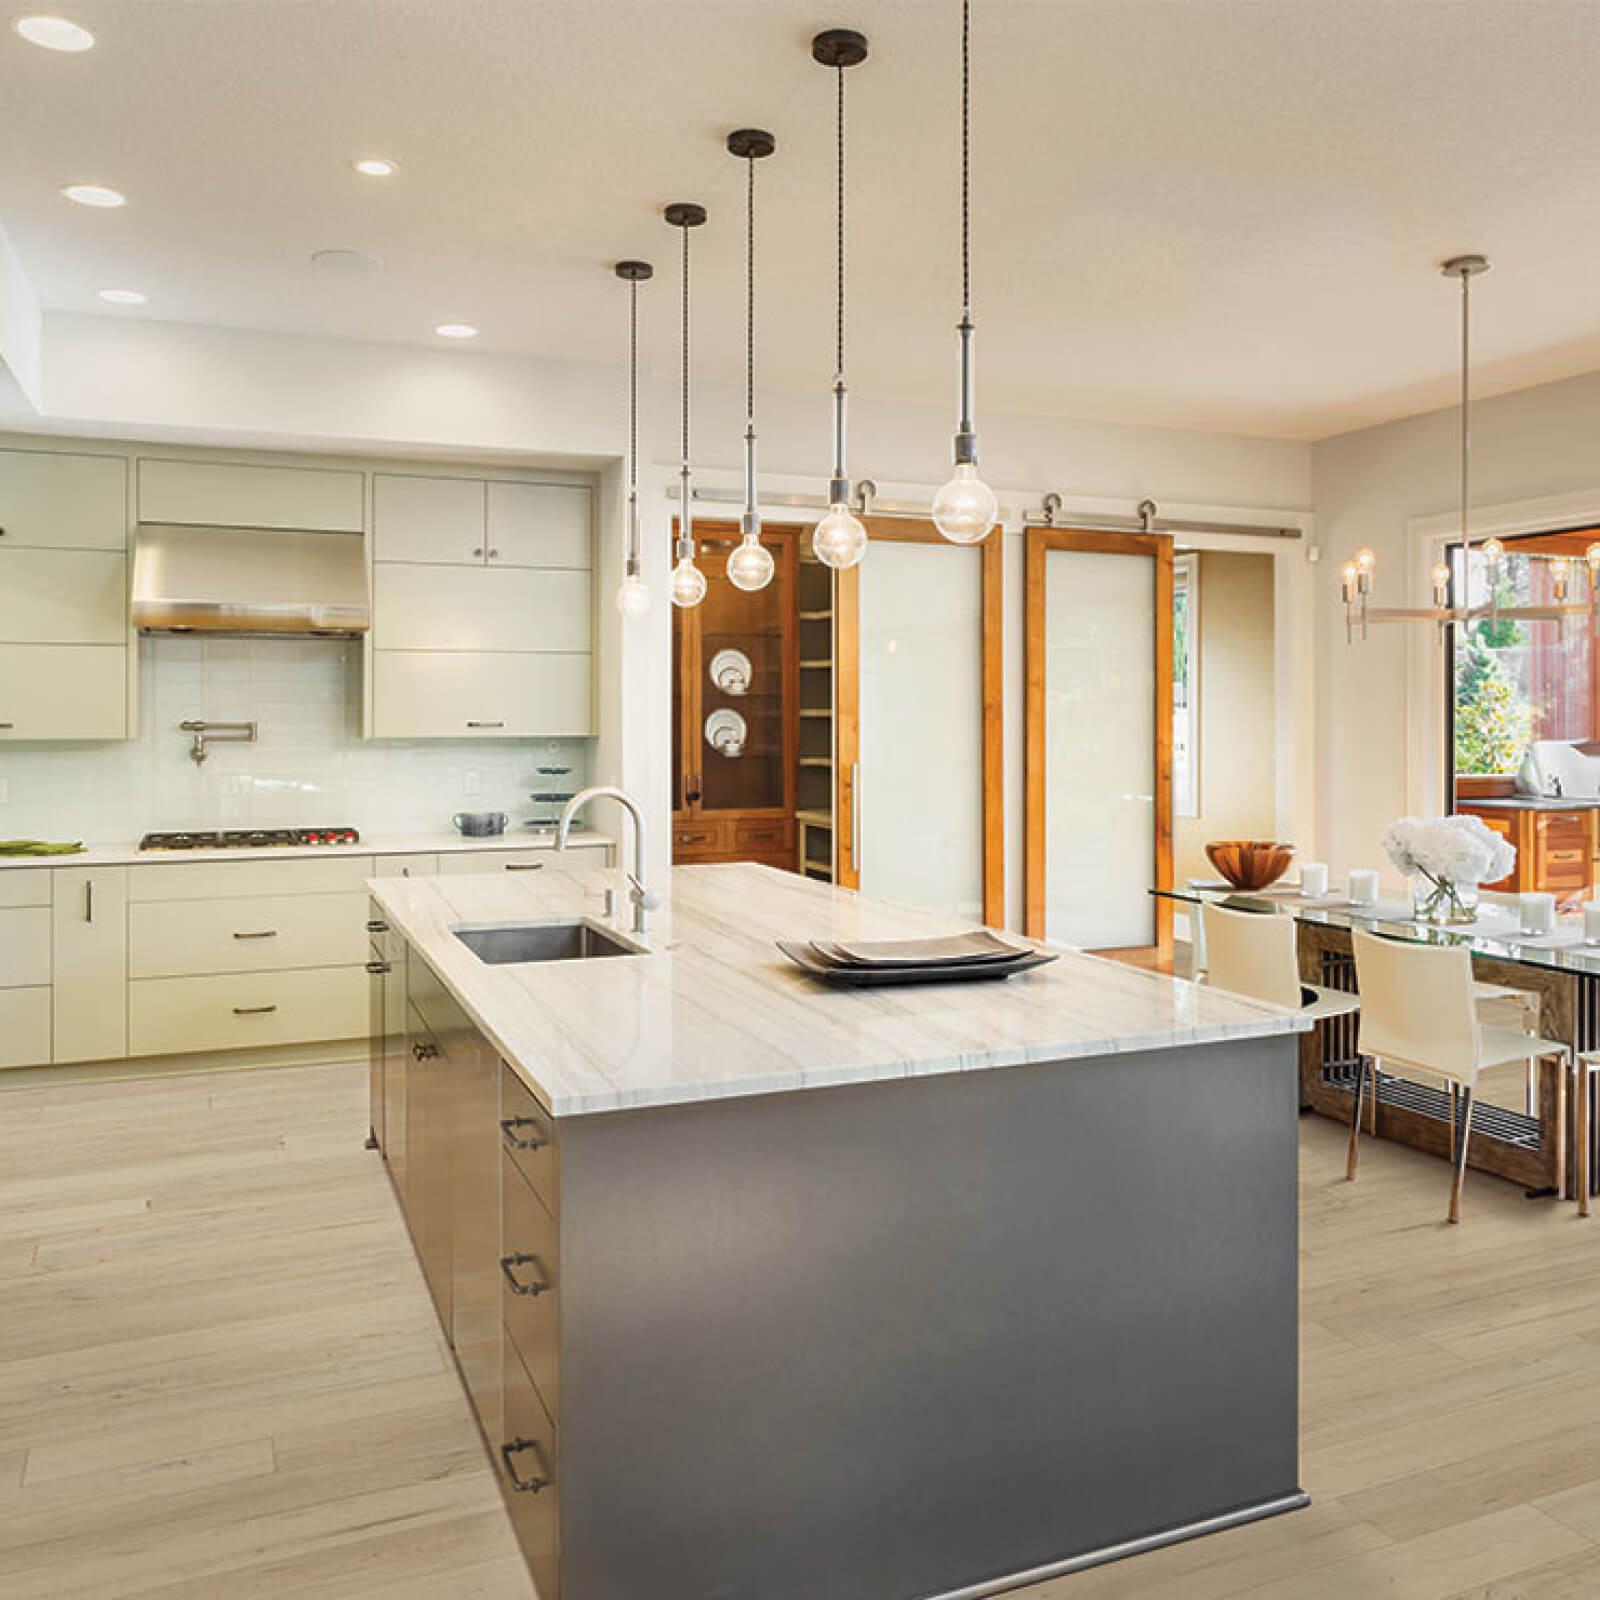 luxury vinyl in kitchen | Dolphin Carpet & Tile